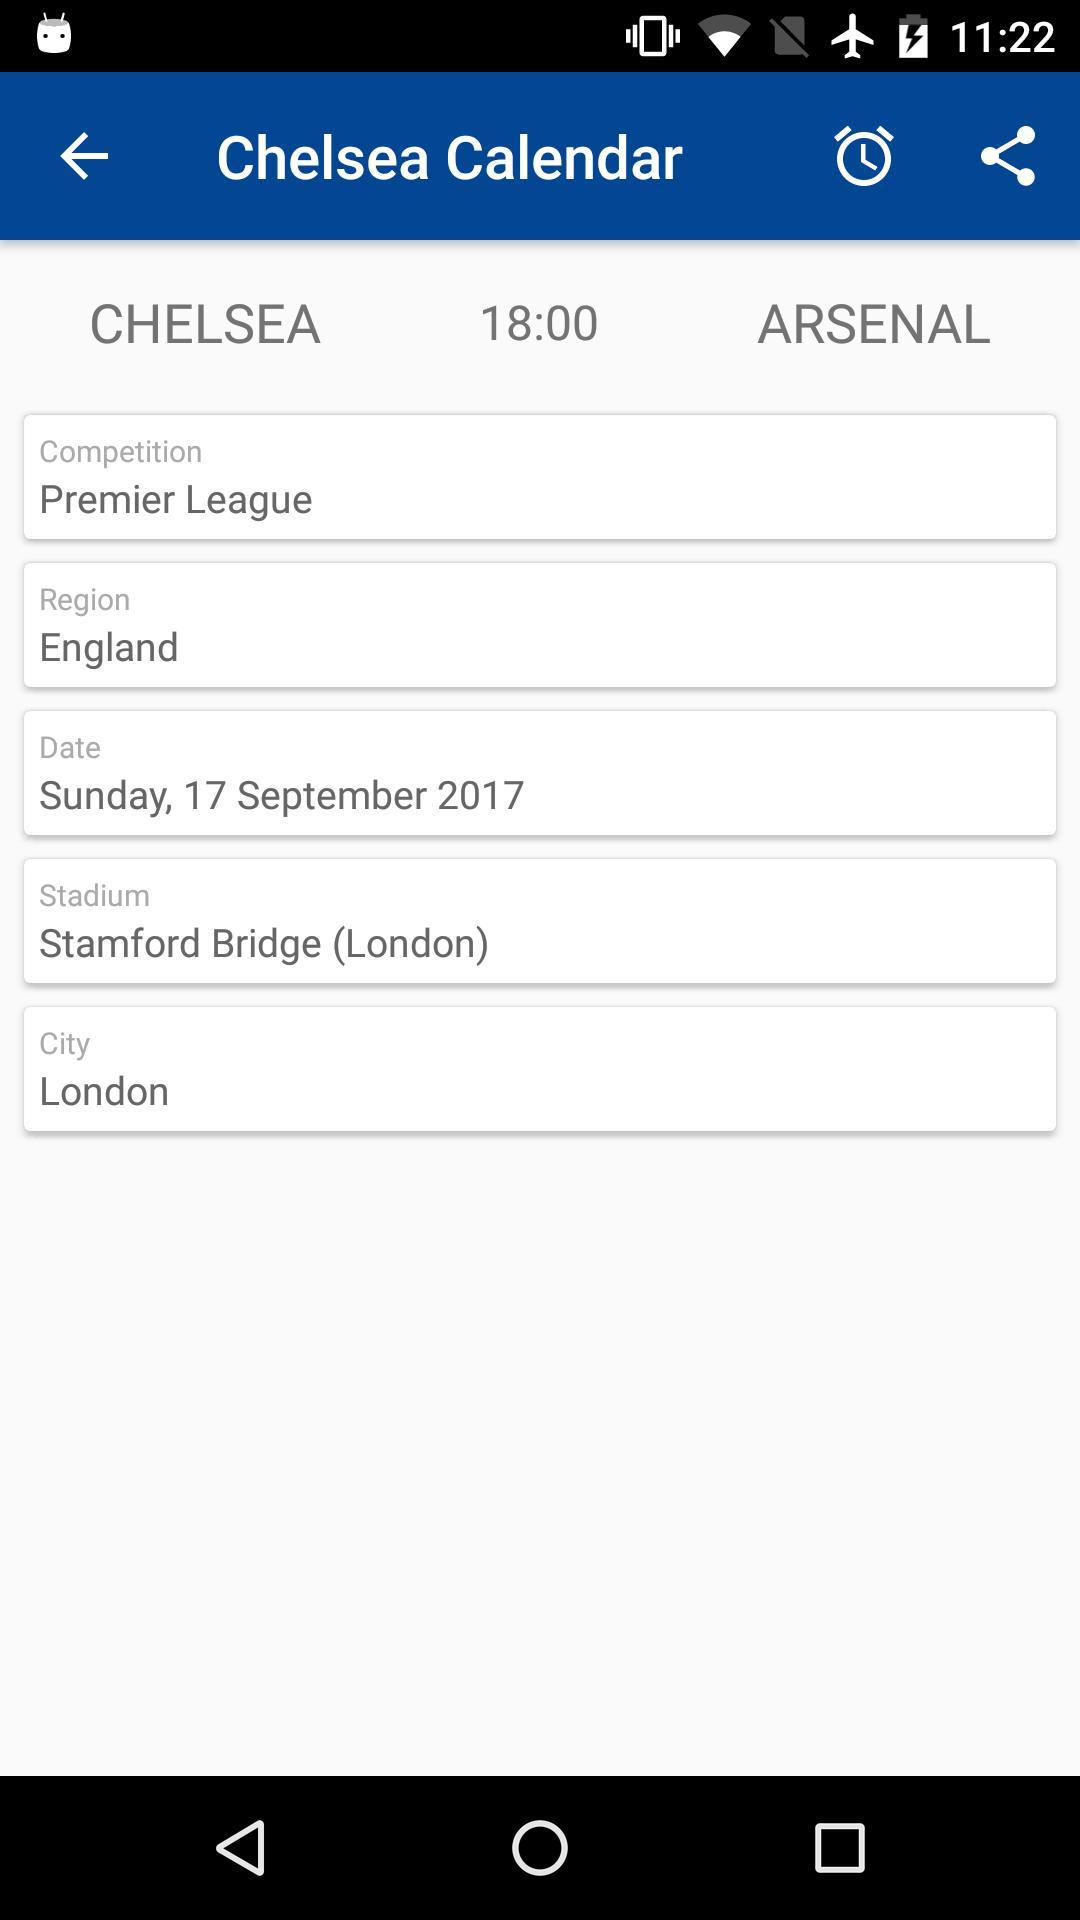 Chelsea Calendario.Chelsea Calendario For Android Apk Download